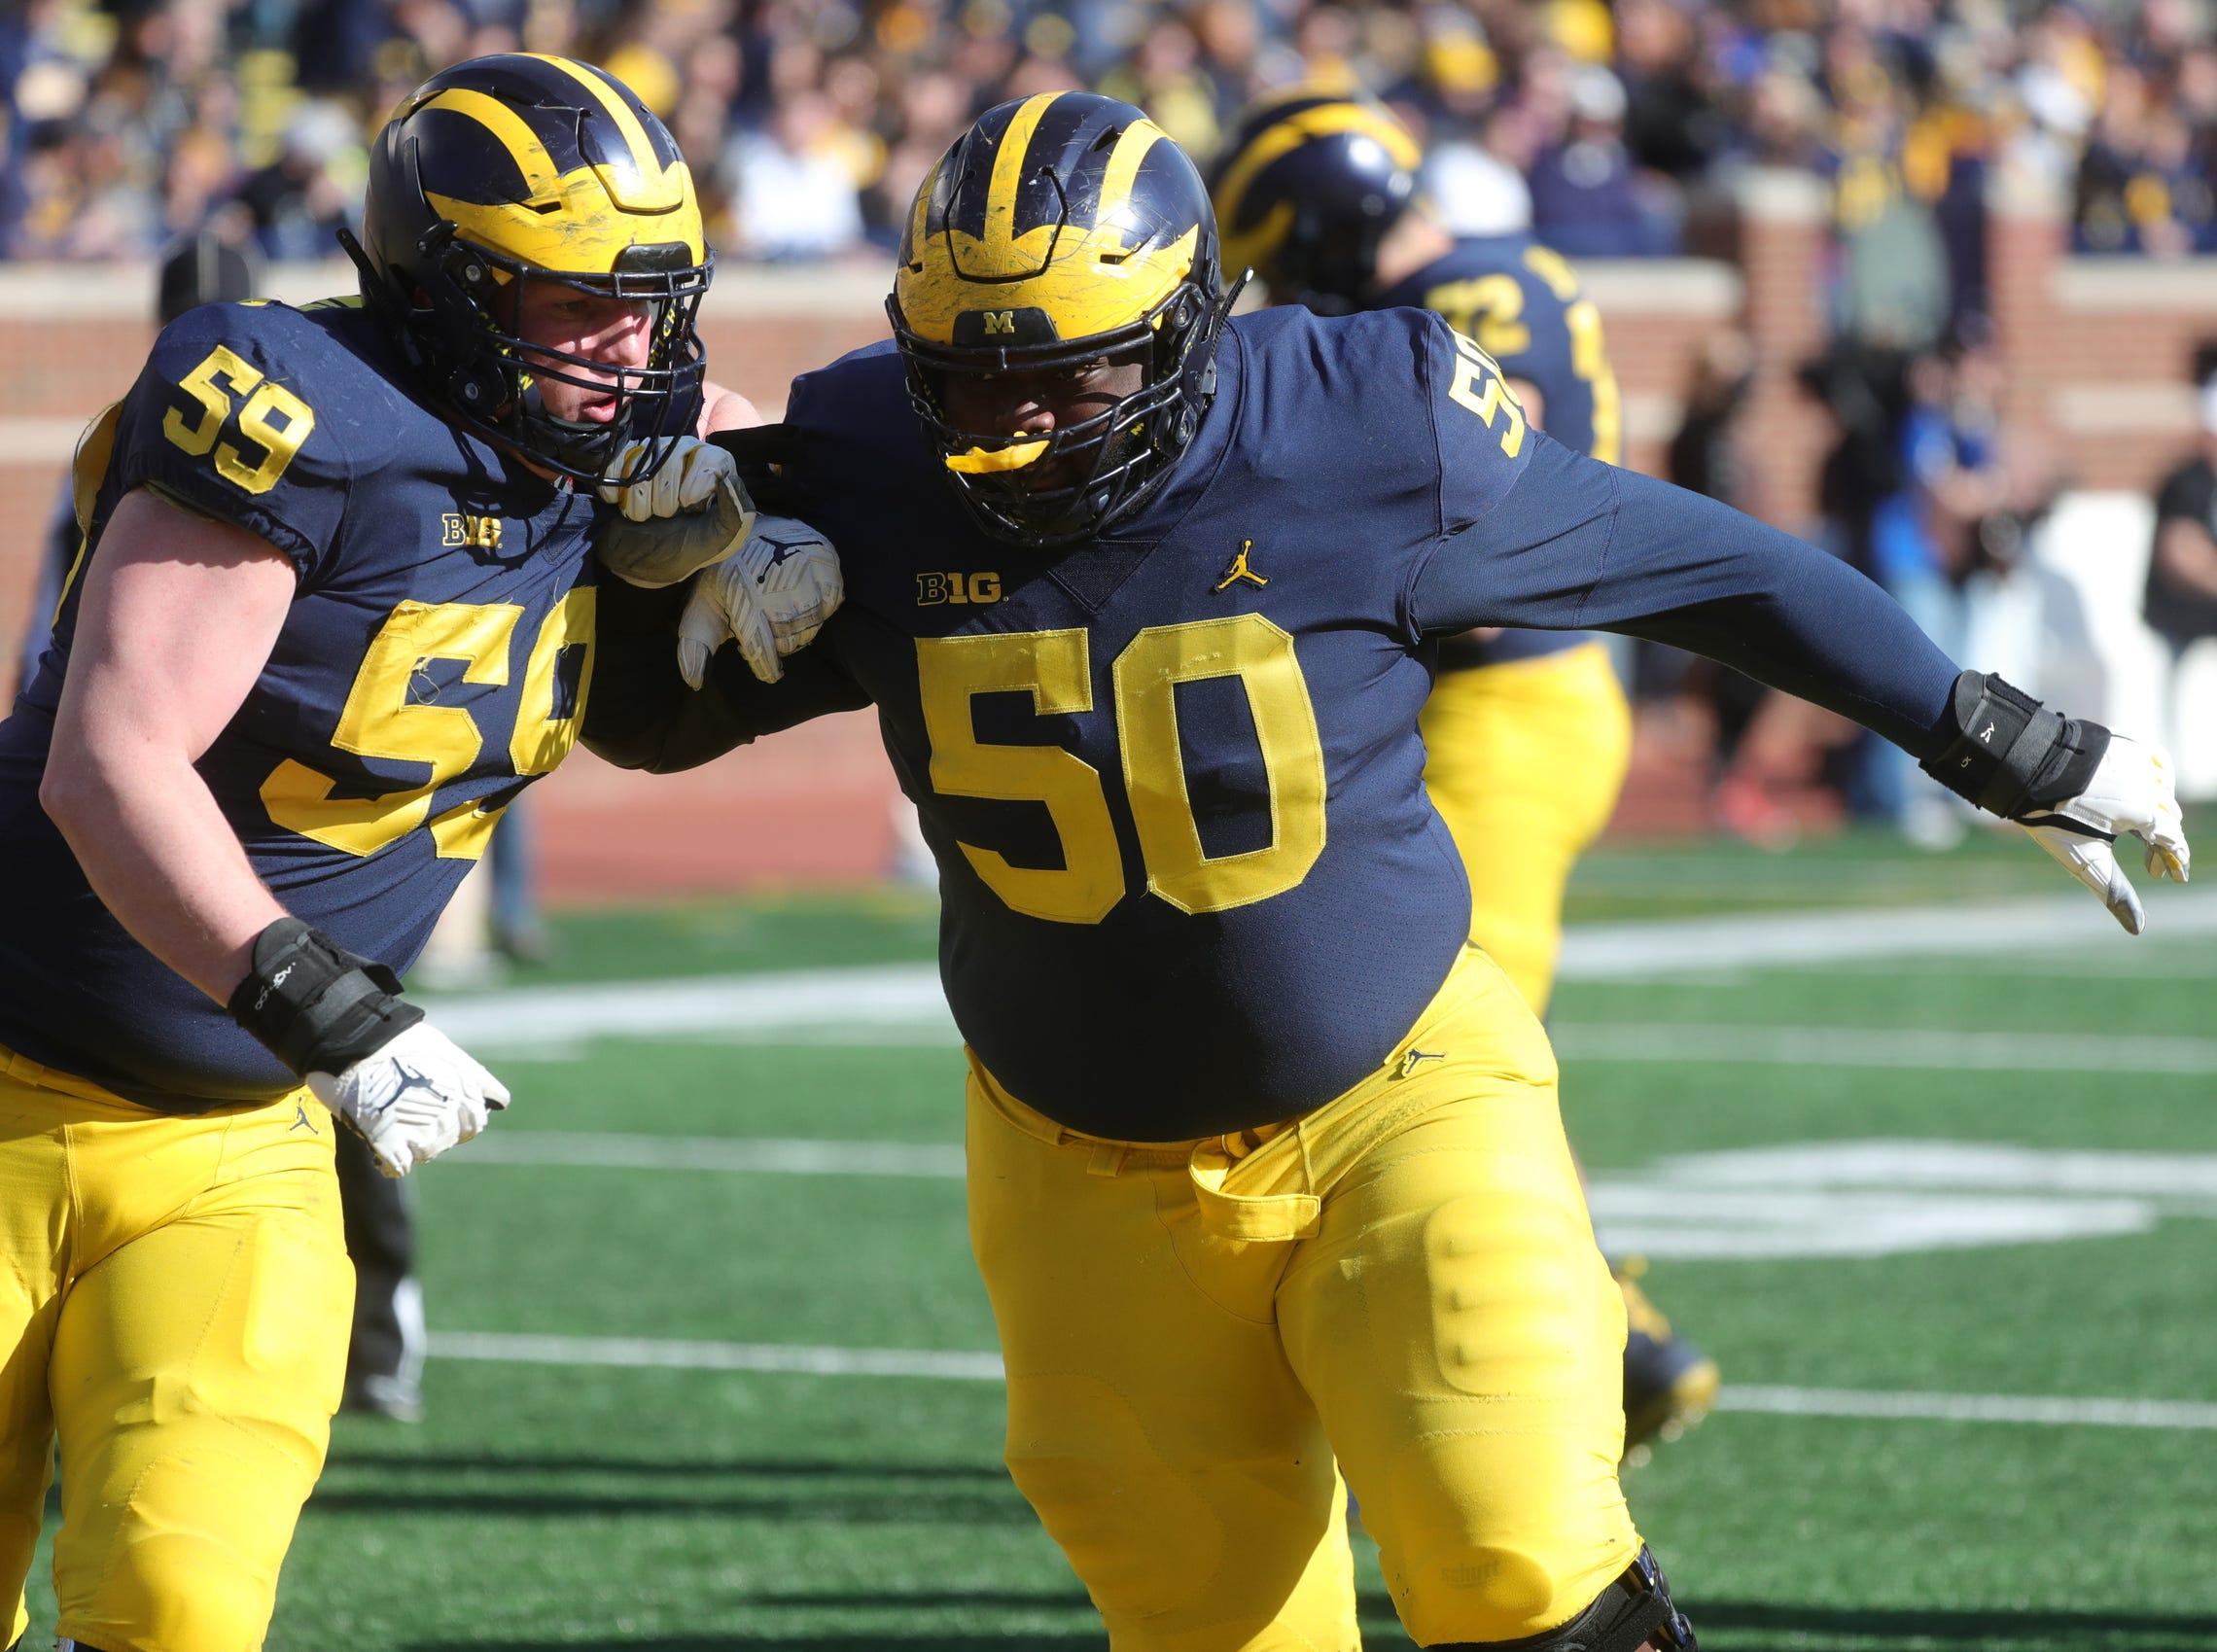 Michigan's Michael Onwenu and Joel Honigford at the spring game Saturday, April 13, 2019 at Michigan Stadium in Ann Arbor.